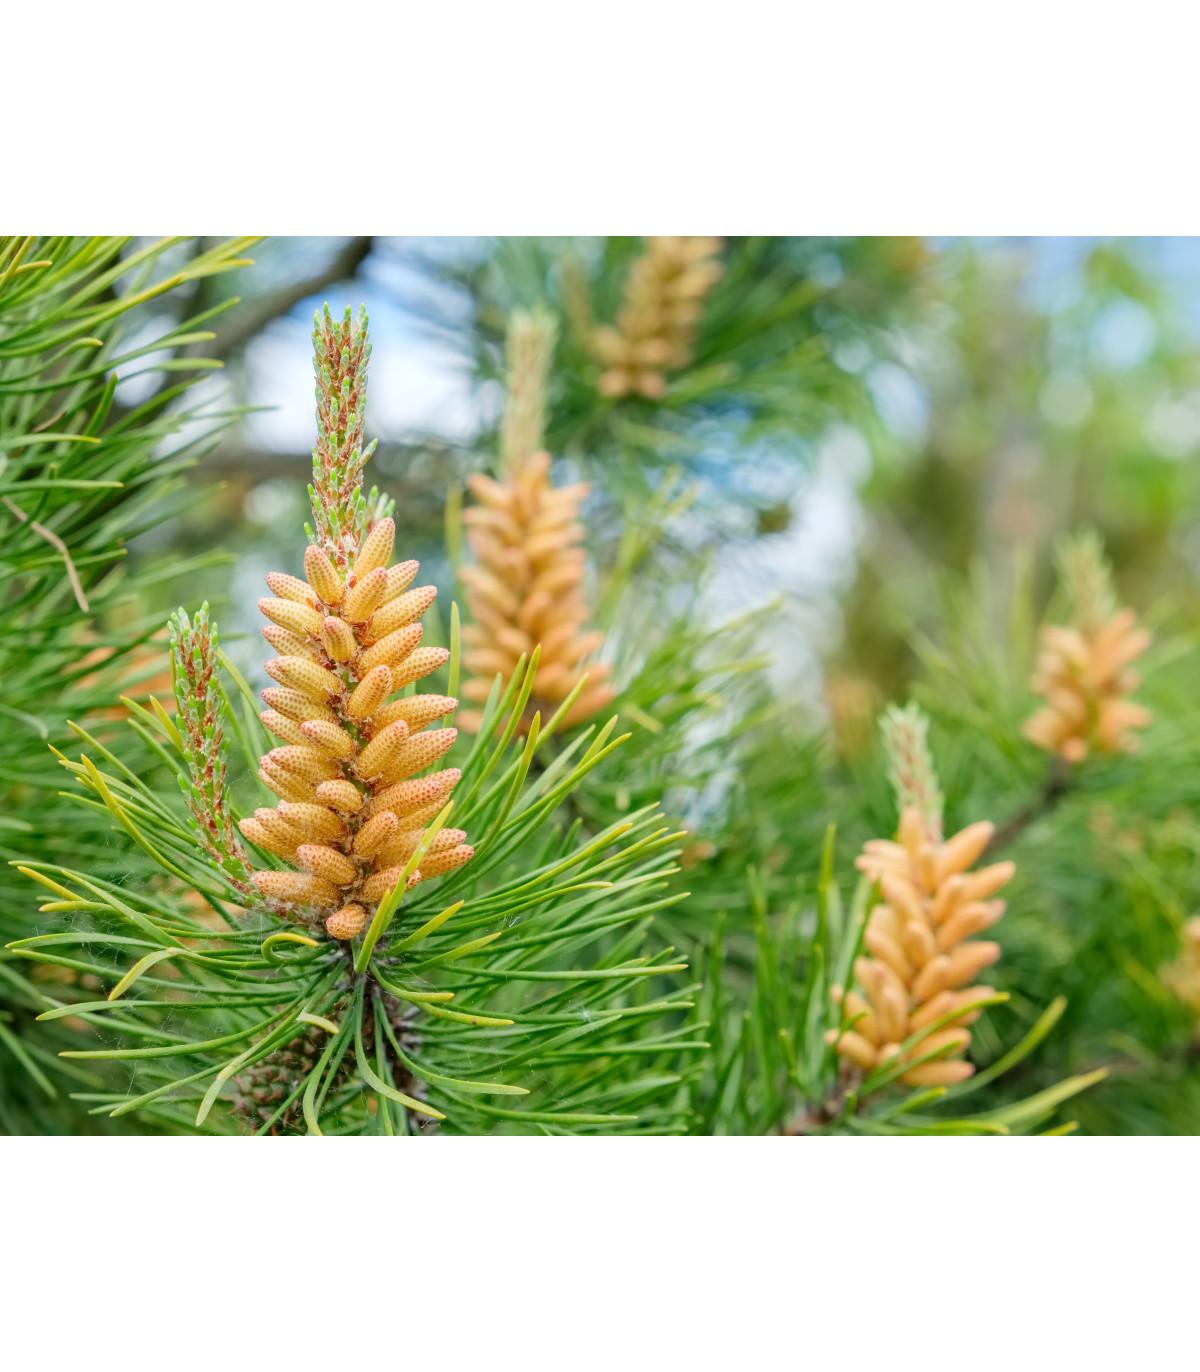 Borovica pokrútená-Pinus contorta-semená borovice-7 ks-